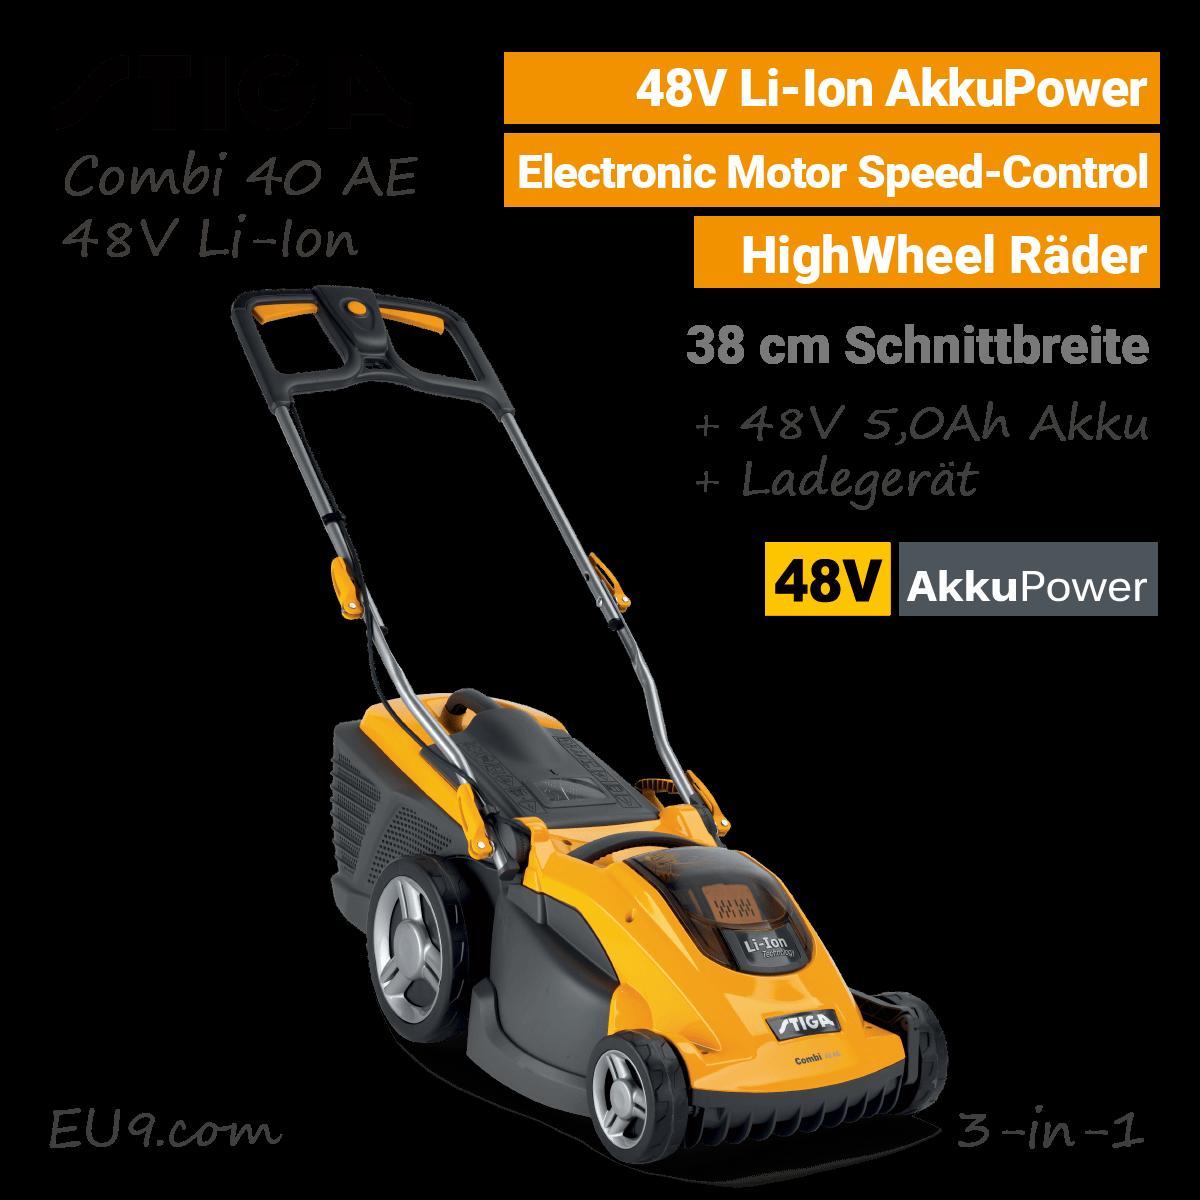 Stiga Combi 40 AE 48V Akku-Rasenmäher 48 Volt EU9